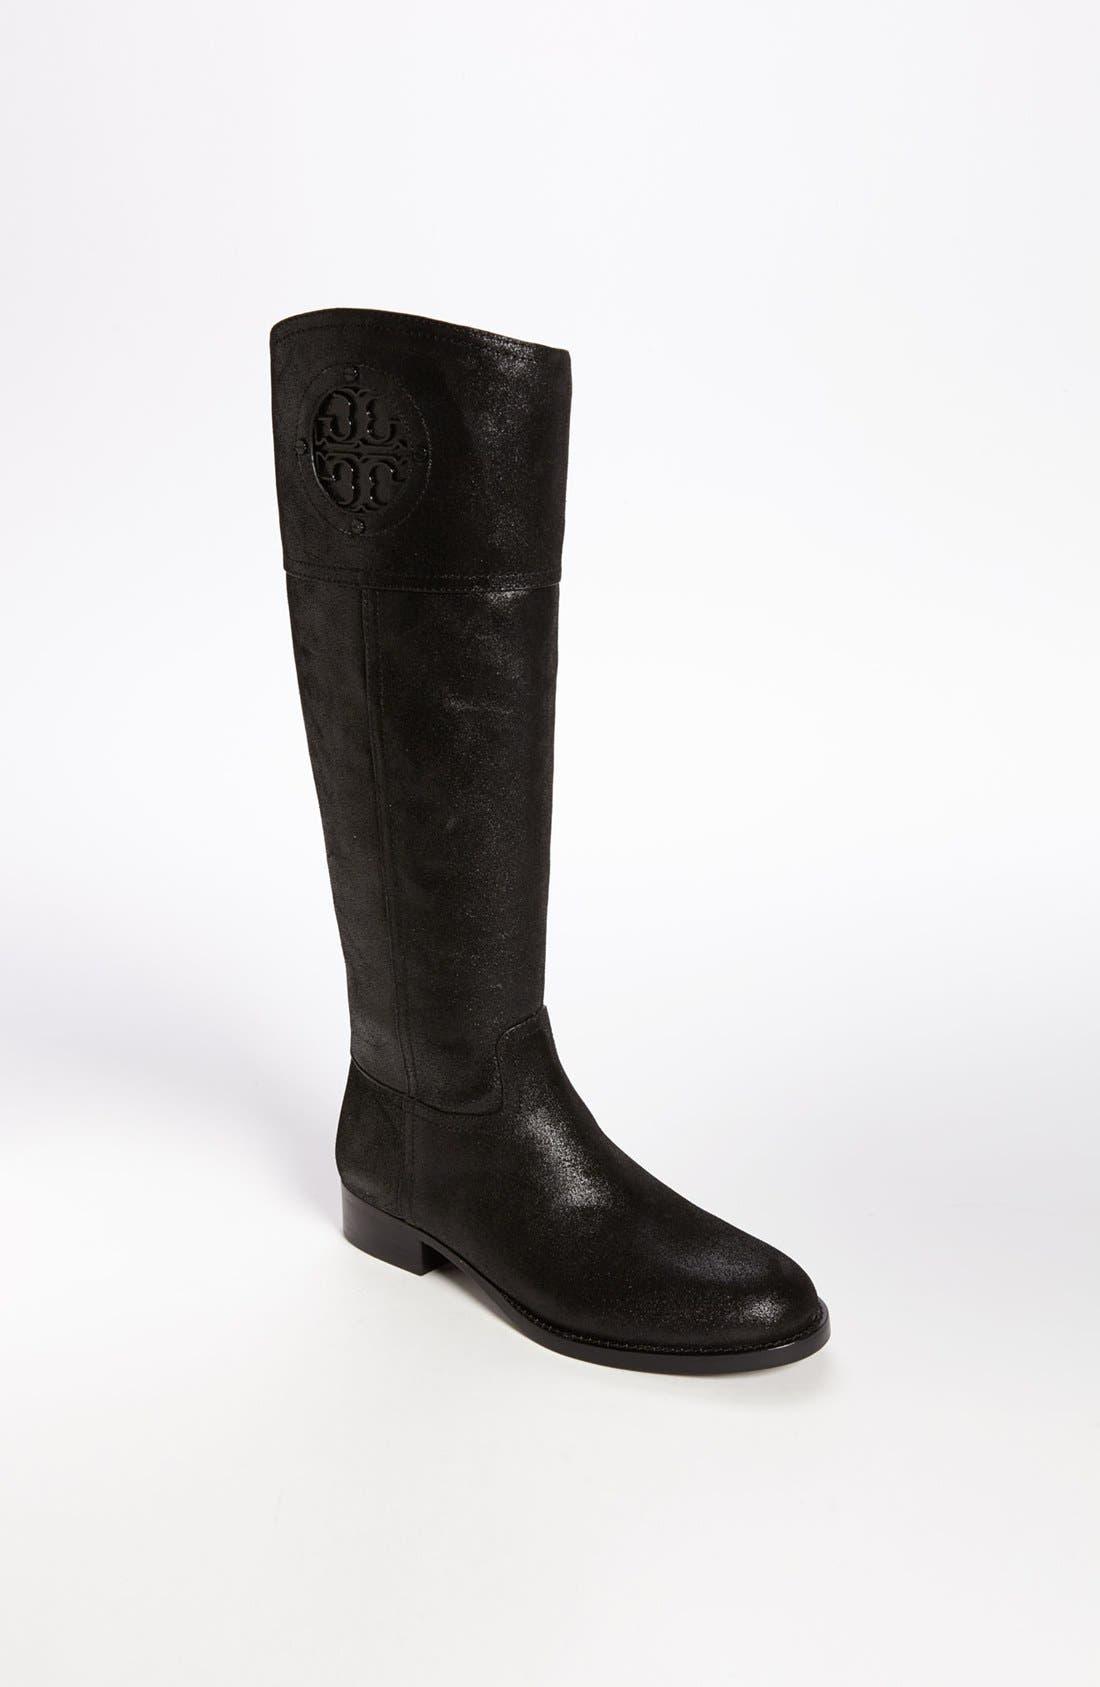 Main Image - Tory Burch 'Kiernan' Boot